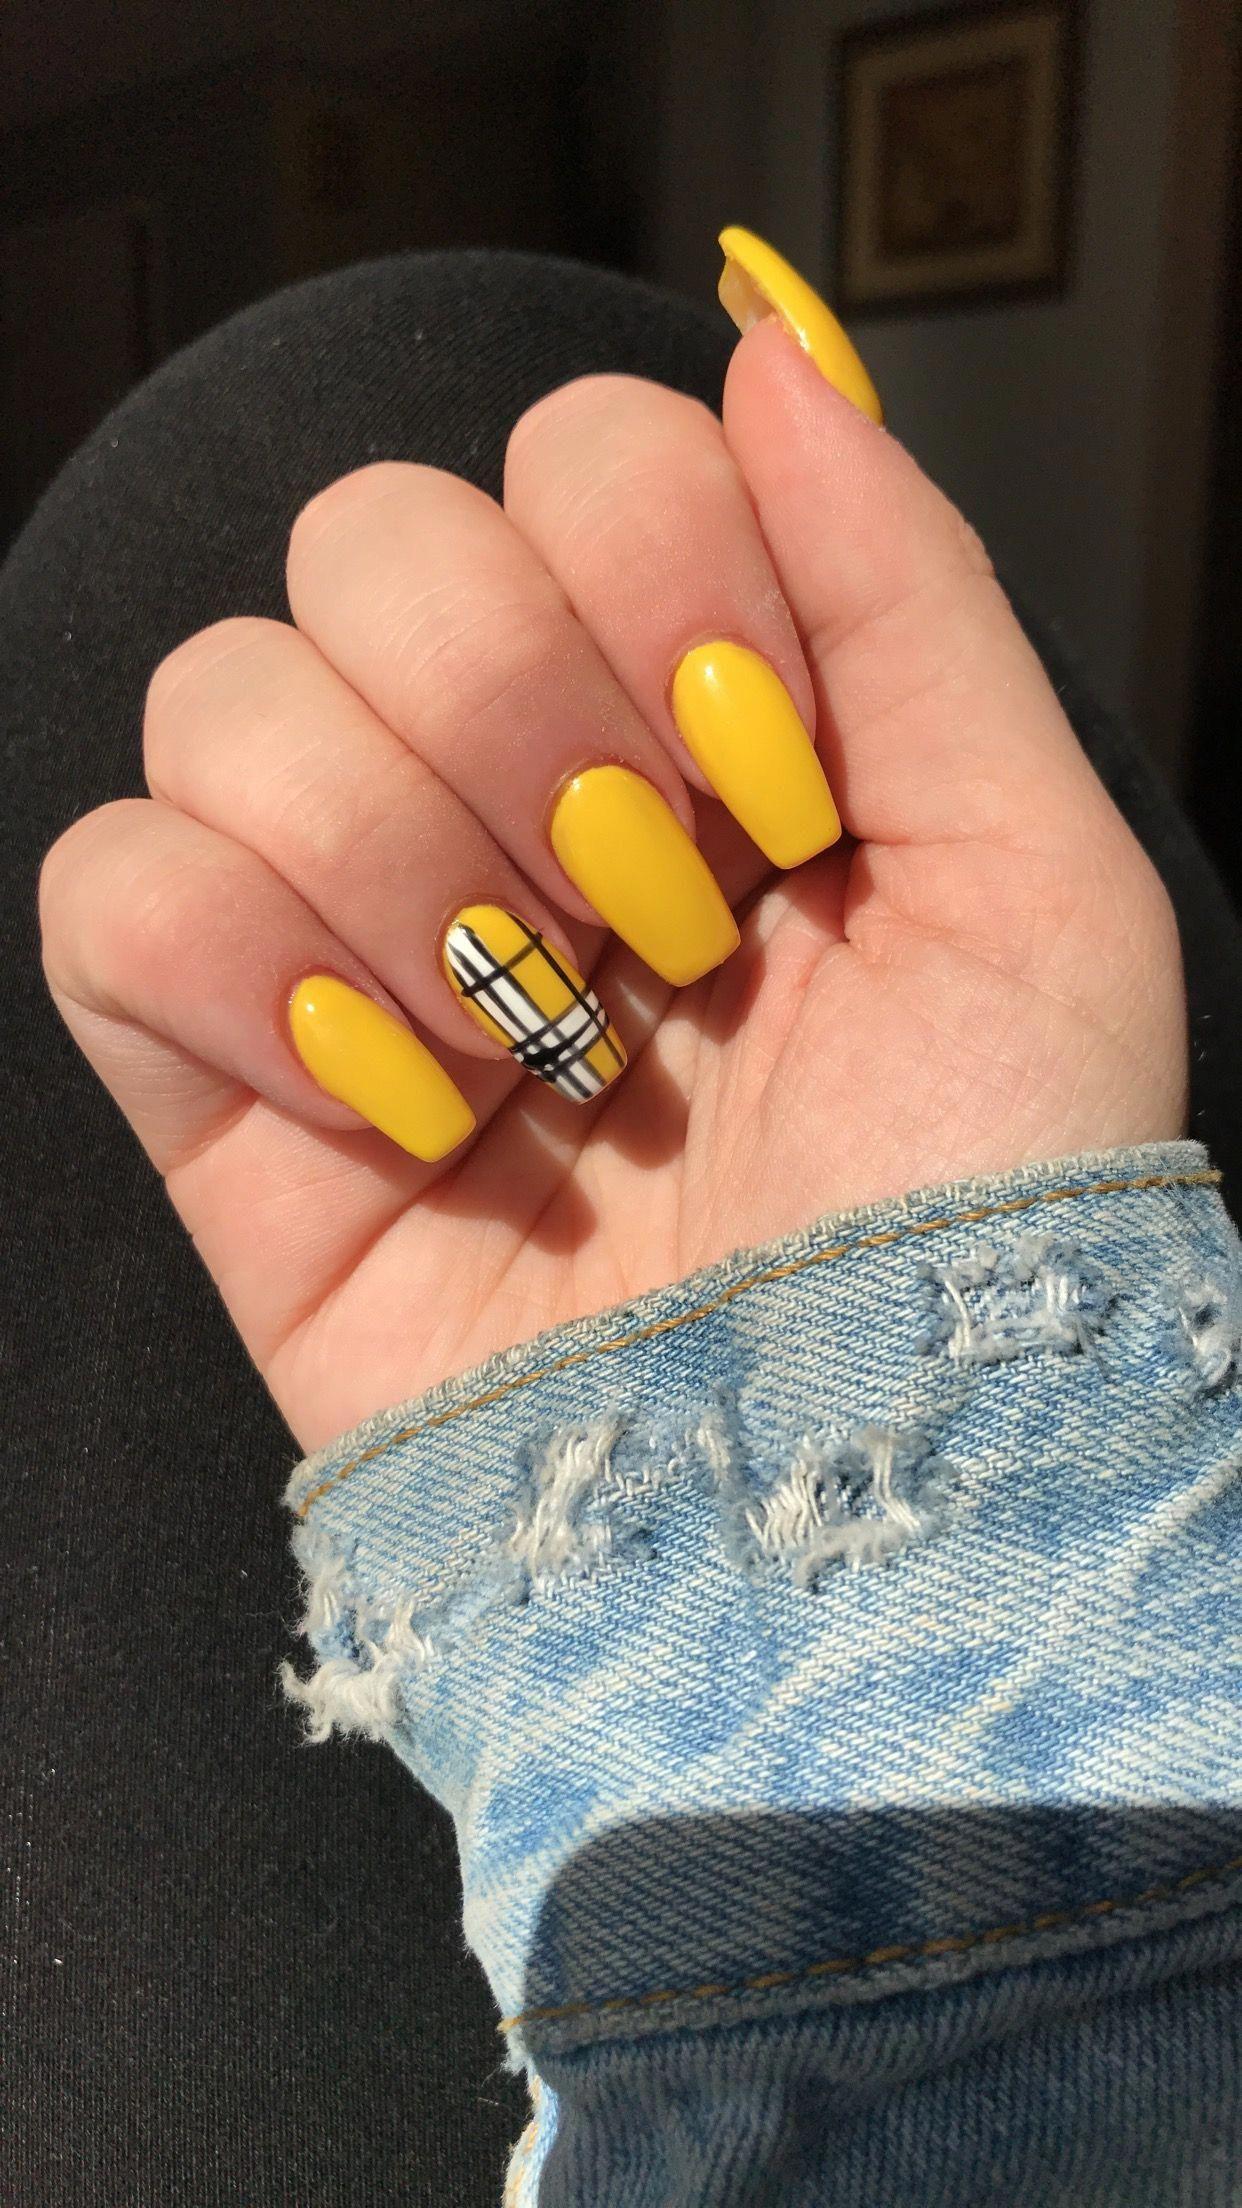 Yellow Plaid Coffin Shaped Acrylic Nails Alreadydesignedunicornideasfornails Yellow Nails Yellow Nails Design Gel Nails French